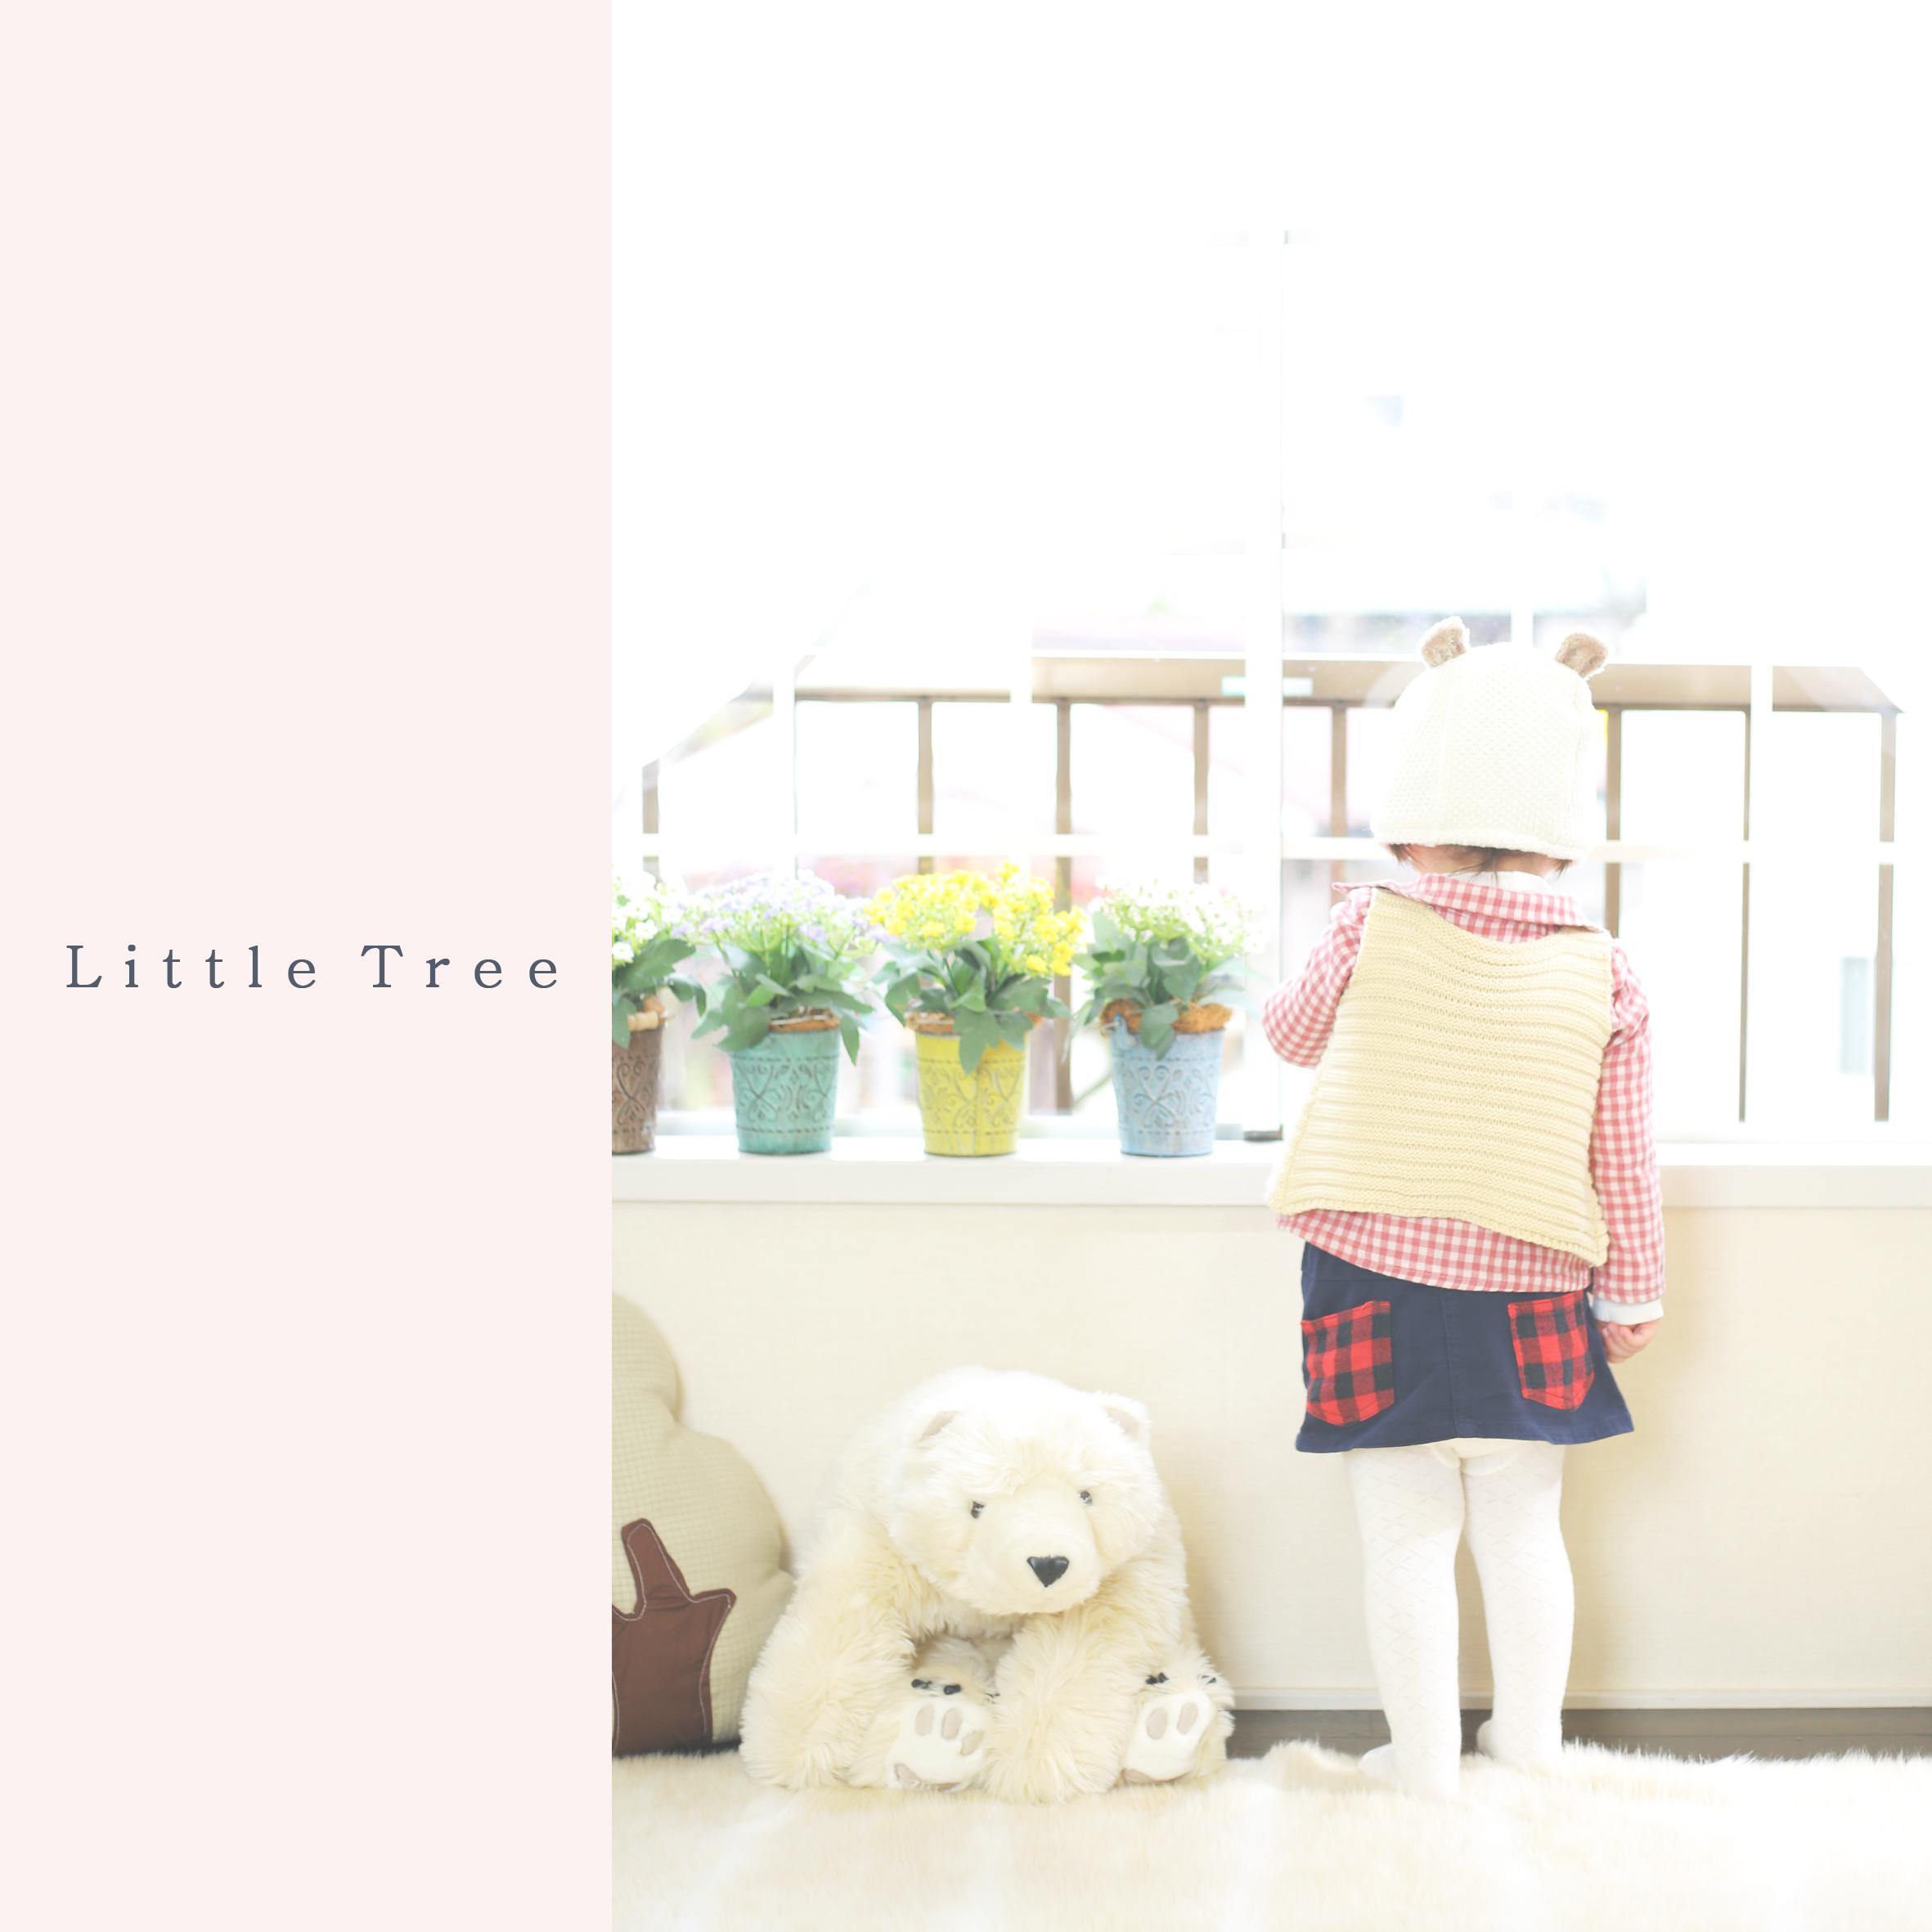 littletree baby161